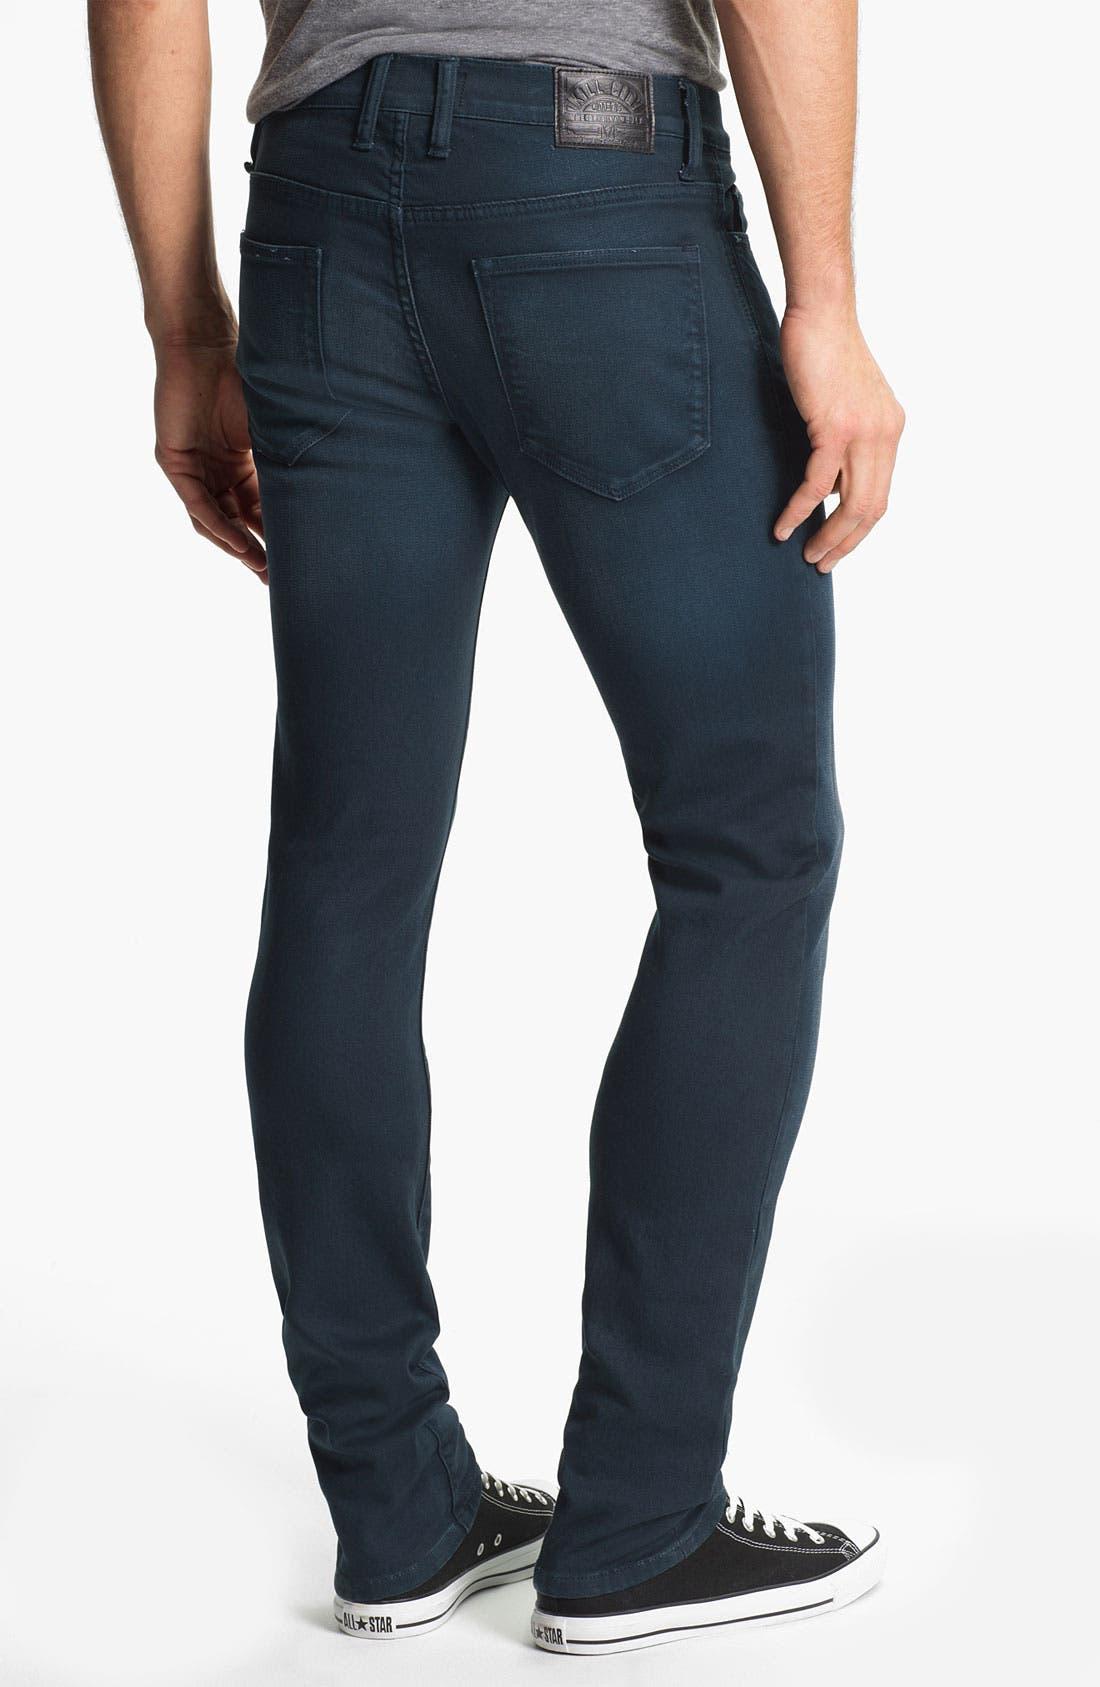 Alternate Image 1 Selected - Kill City 'Wire' Slim Skinny Leg Jeans (Navy)